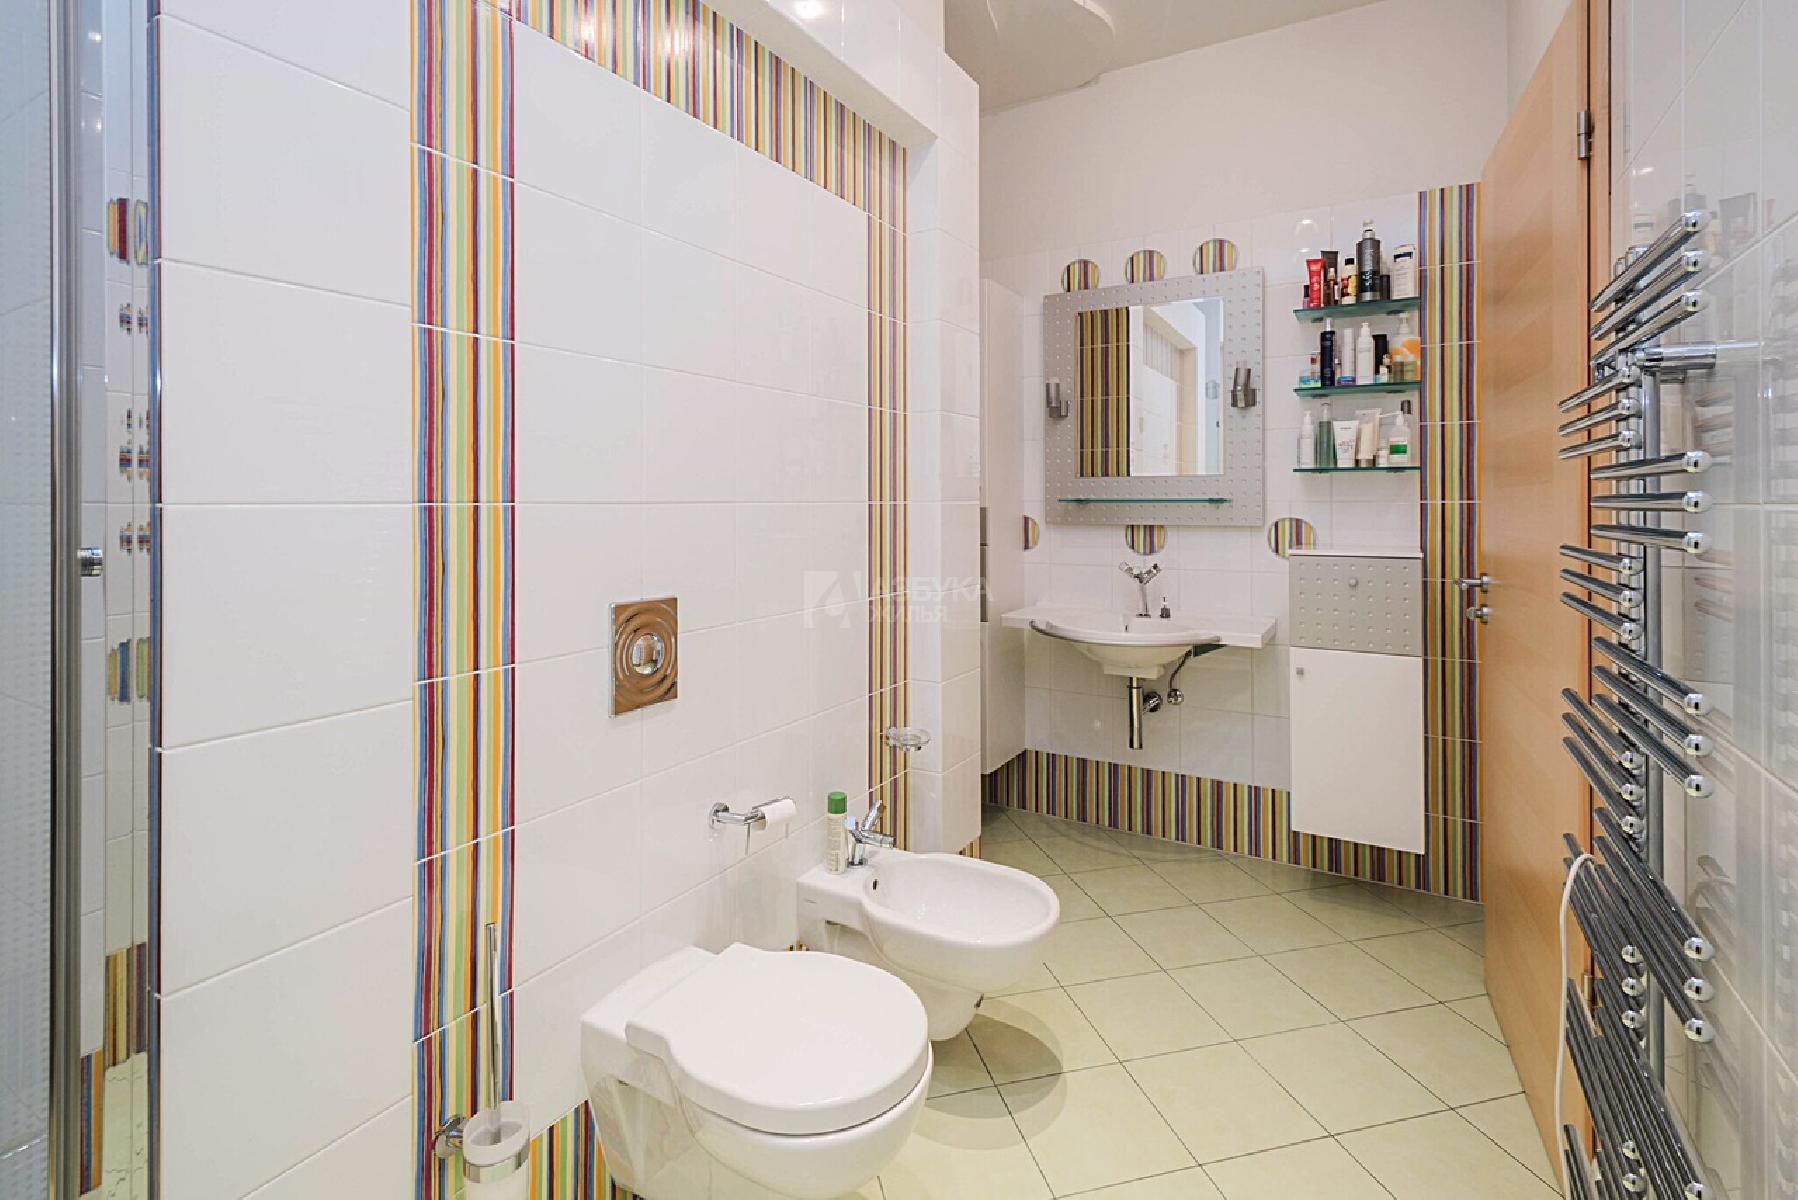 Фото №8 - 5-комнатная квартира, Москва, Авиационная улица 77, метро Щукинская